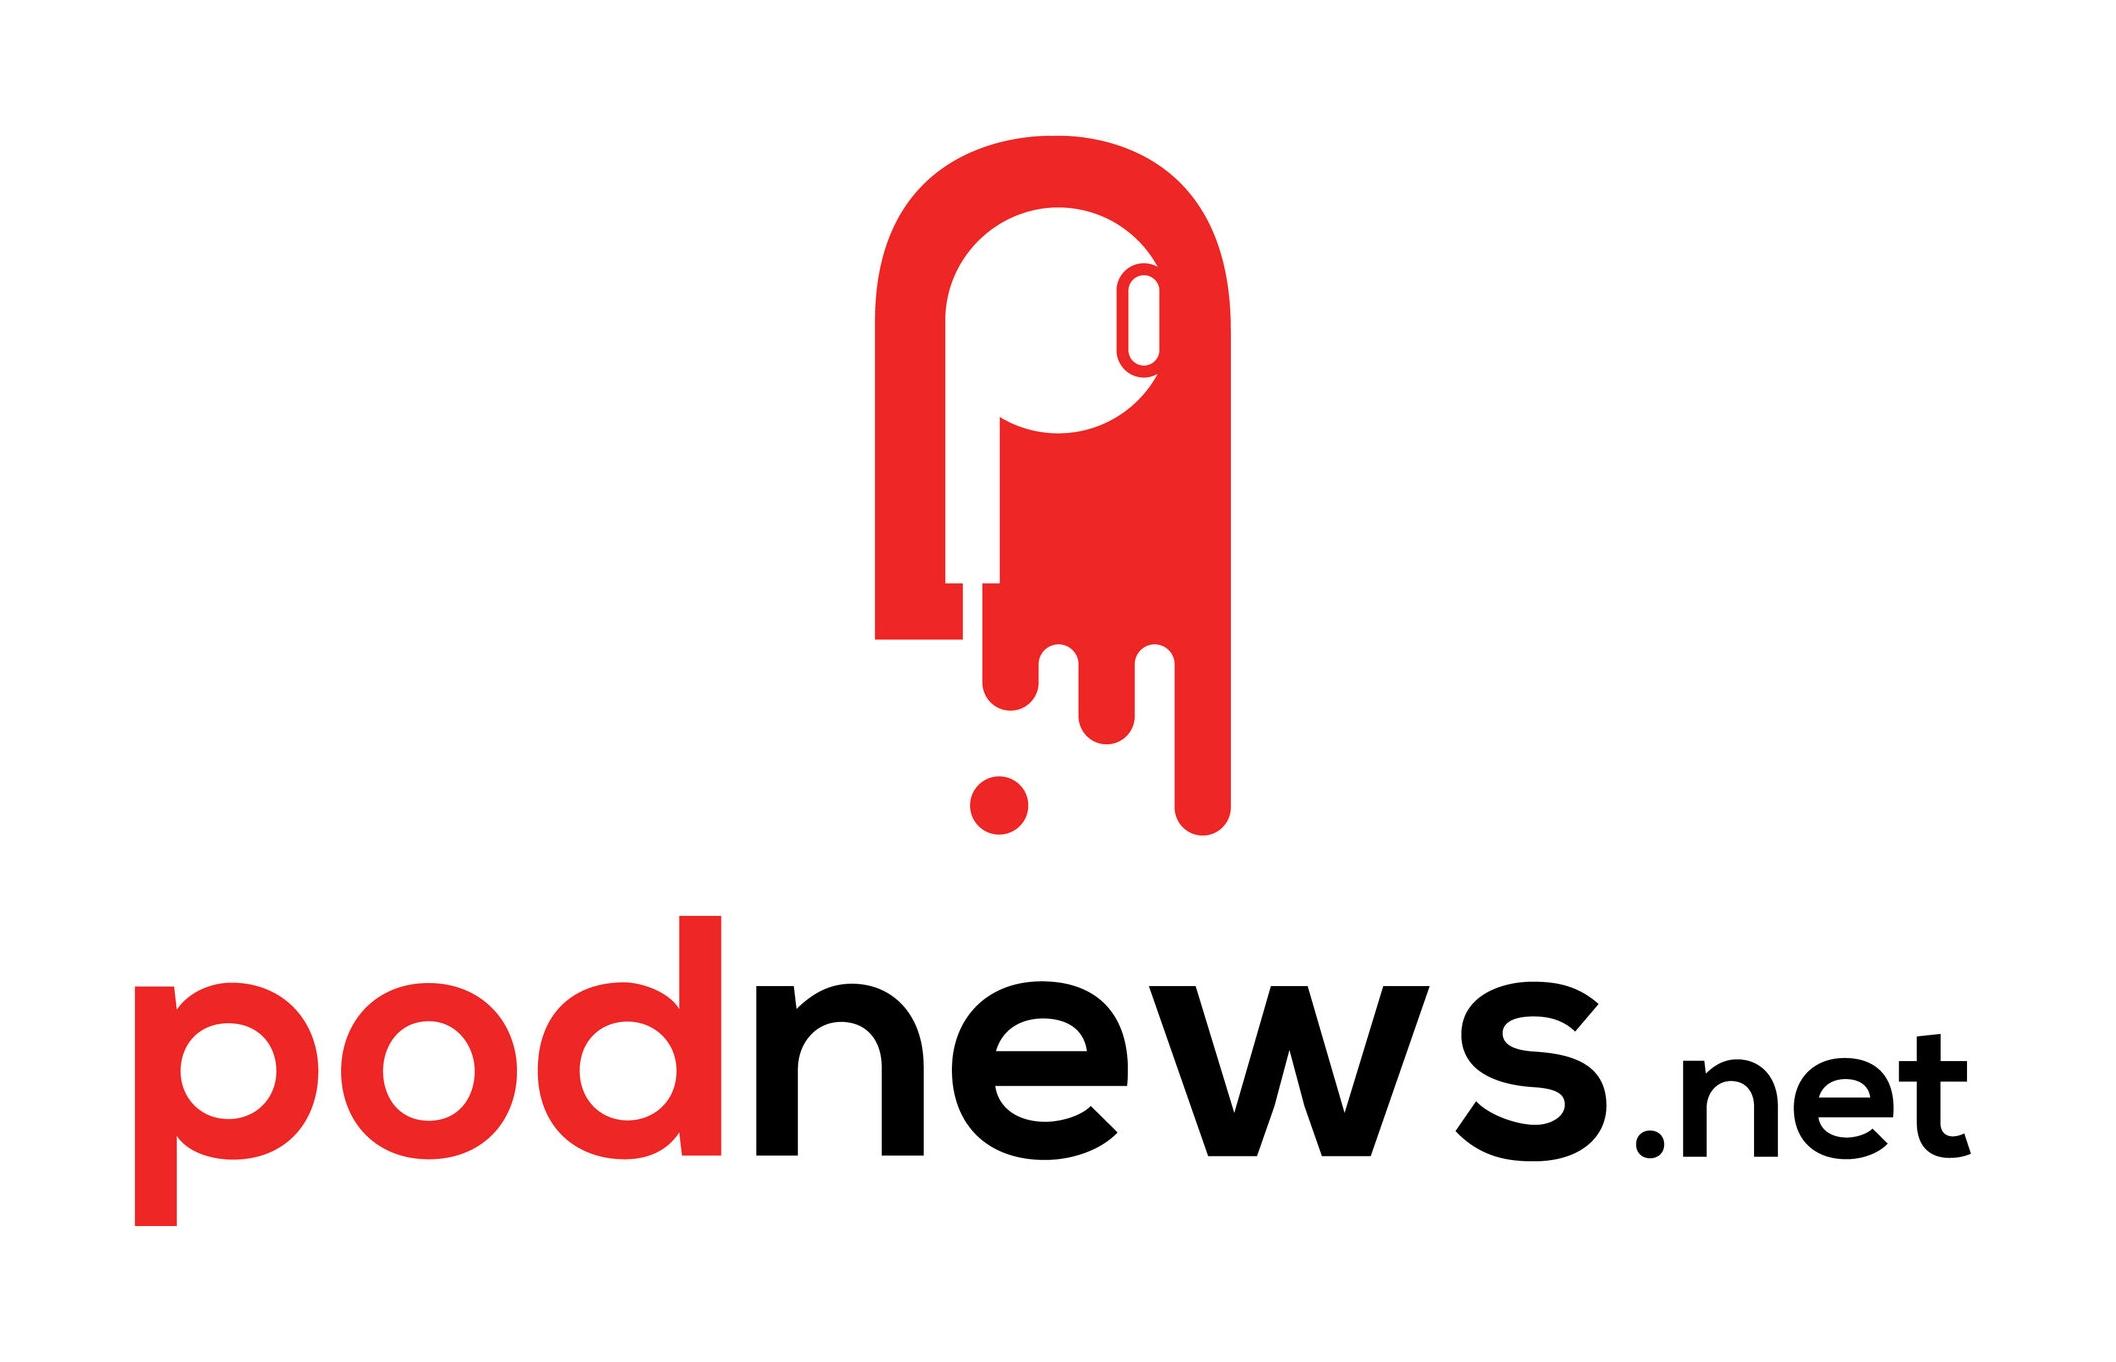 podnews